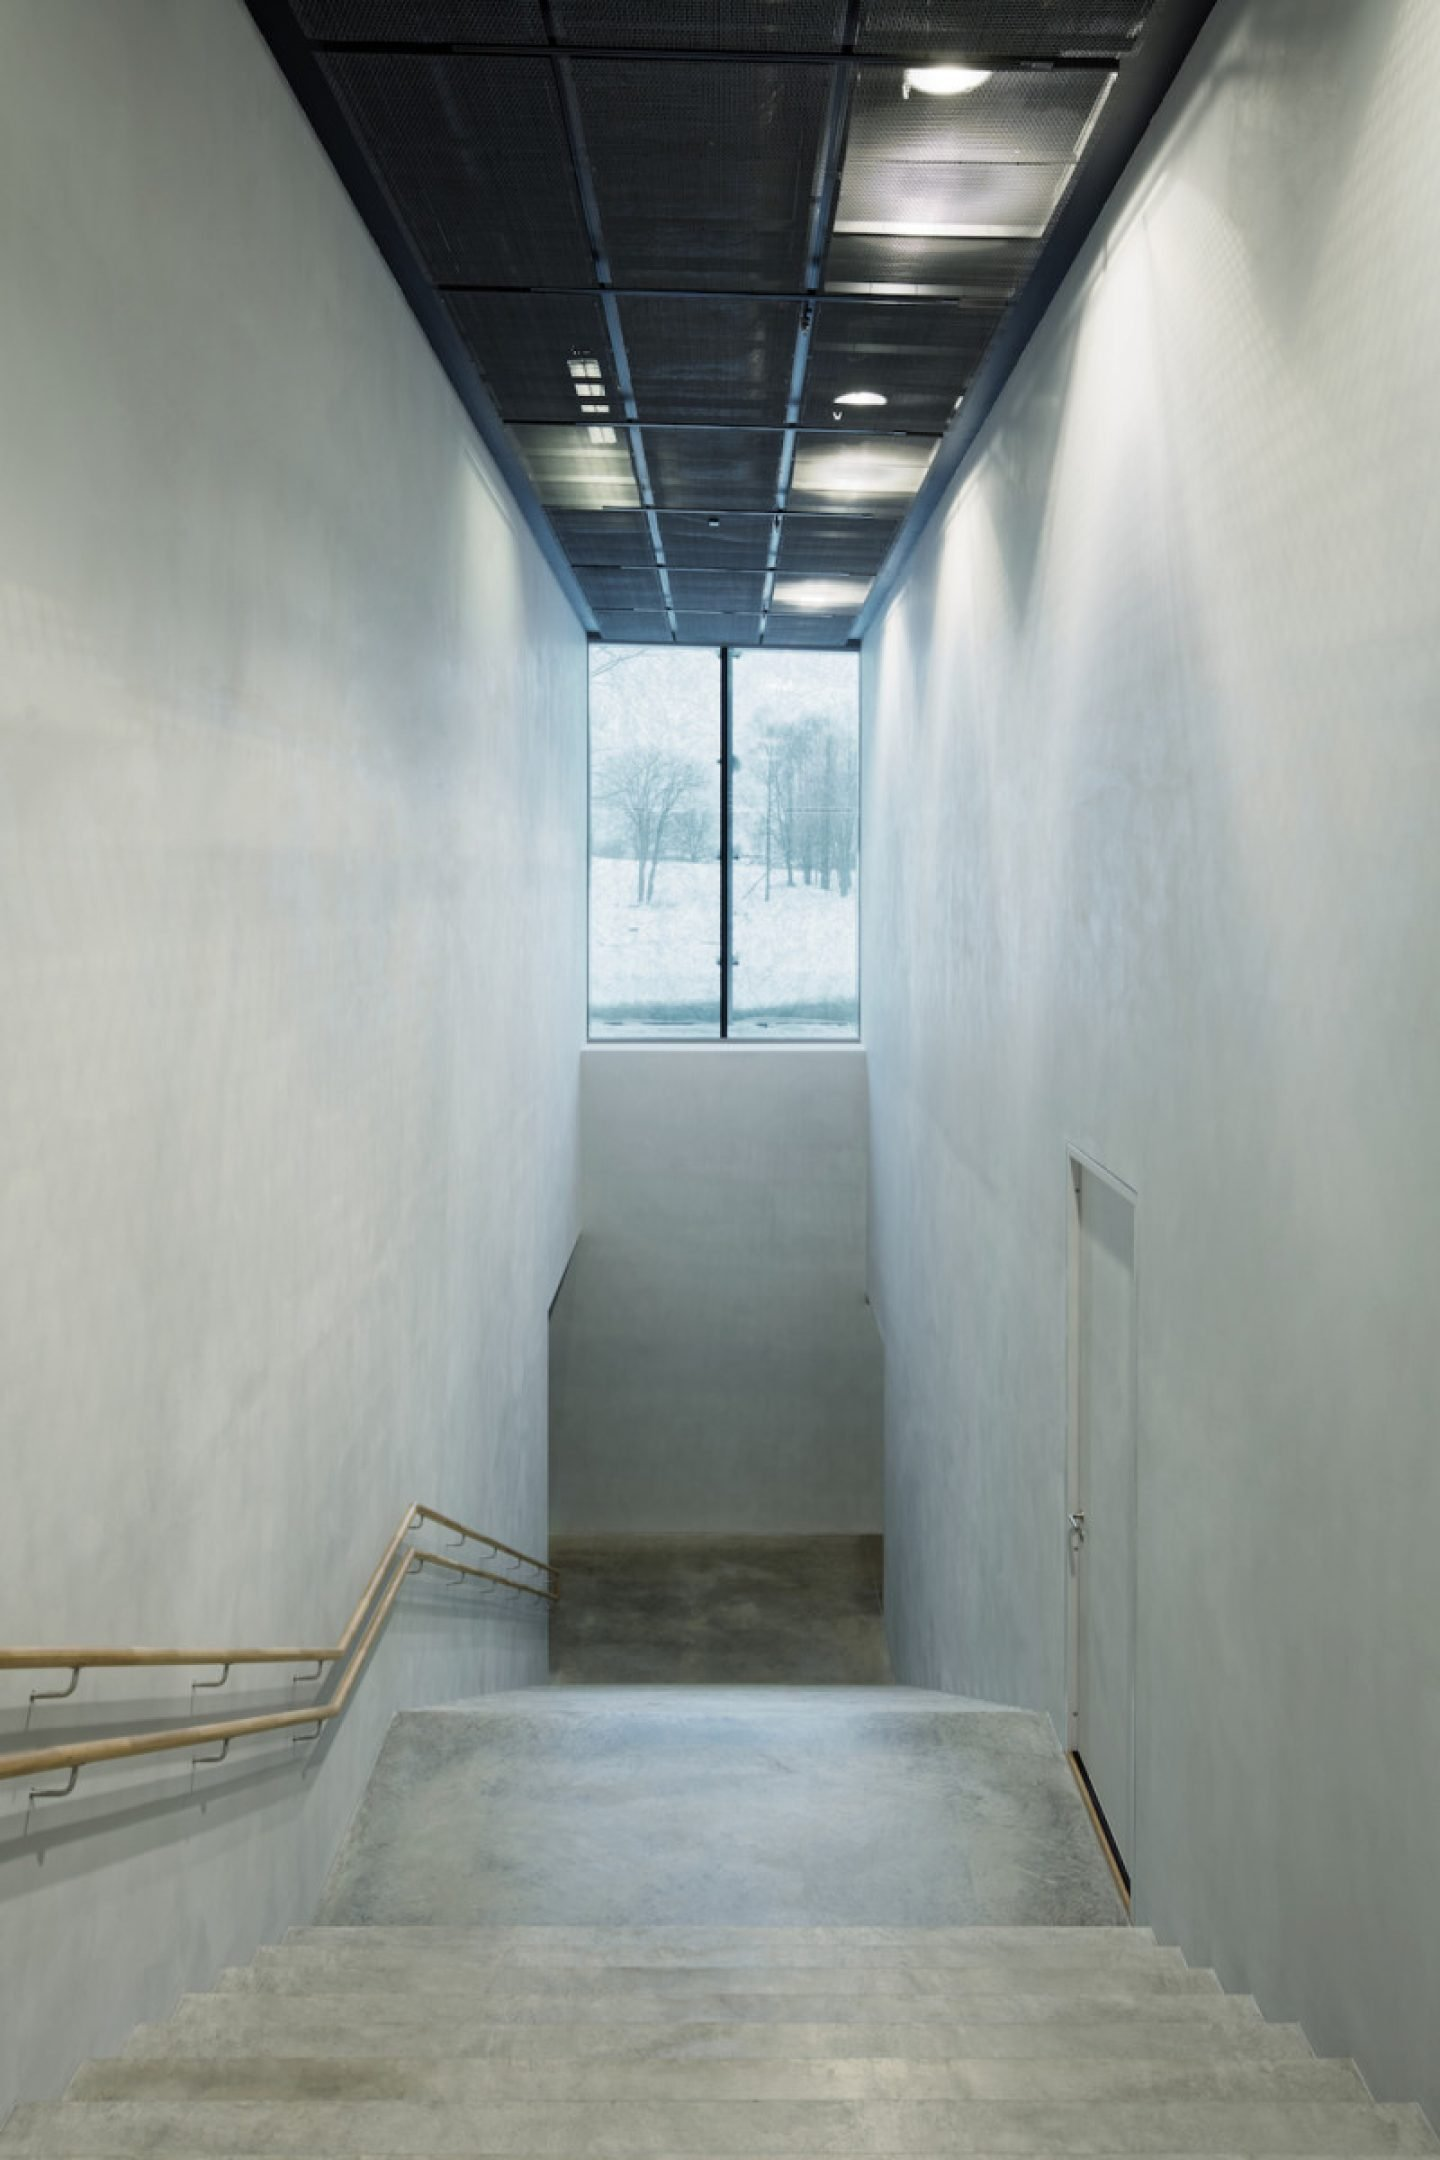 DGT_Architecture_2151_DxO @TAKUJI SHIMMURA LR